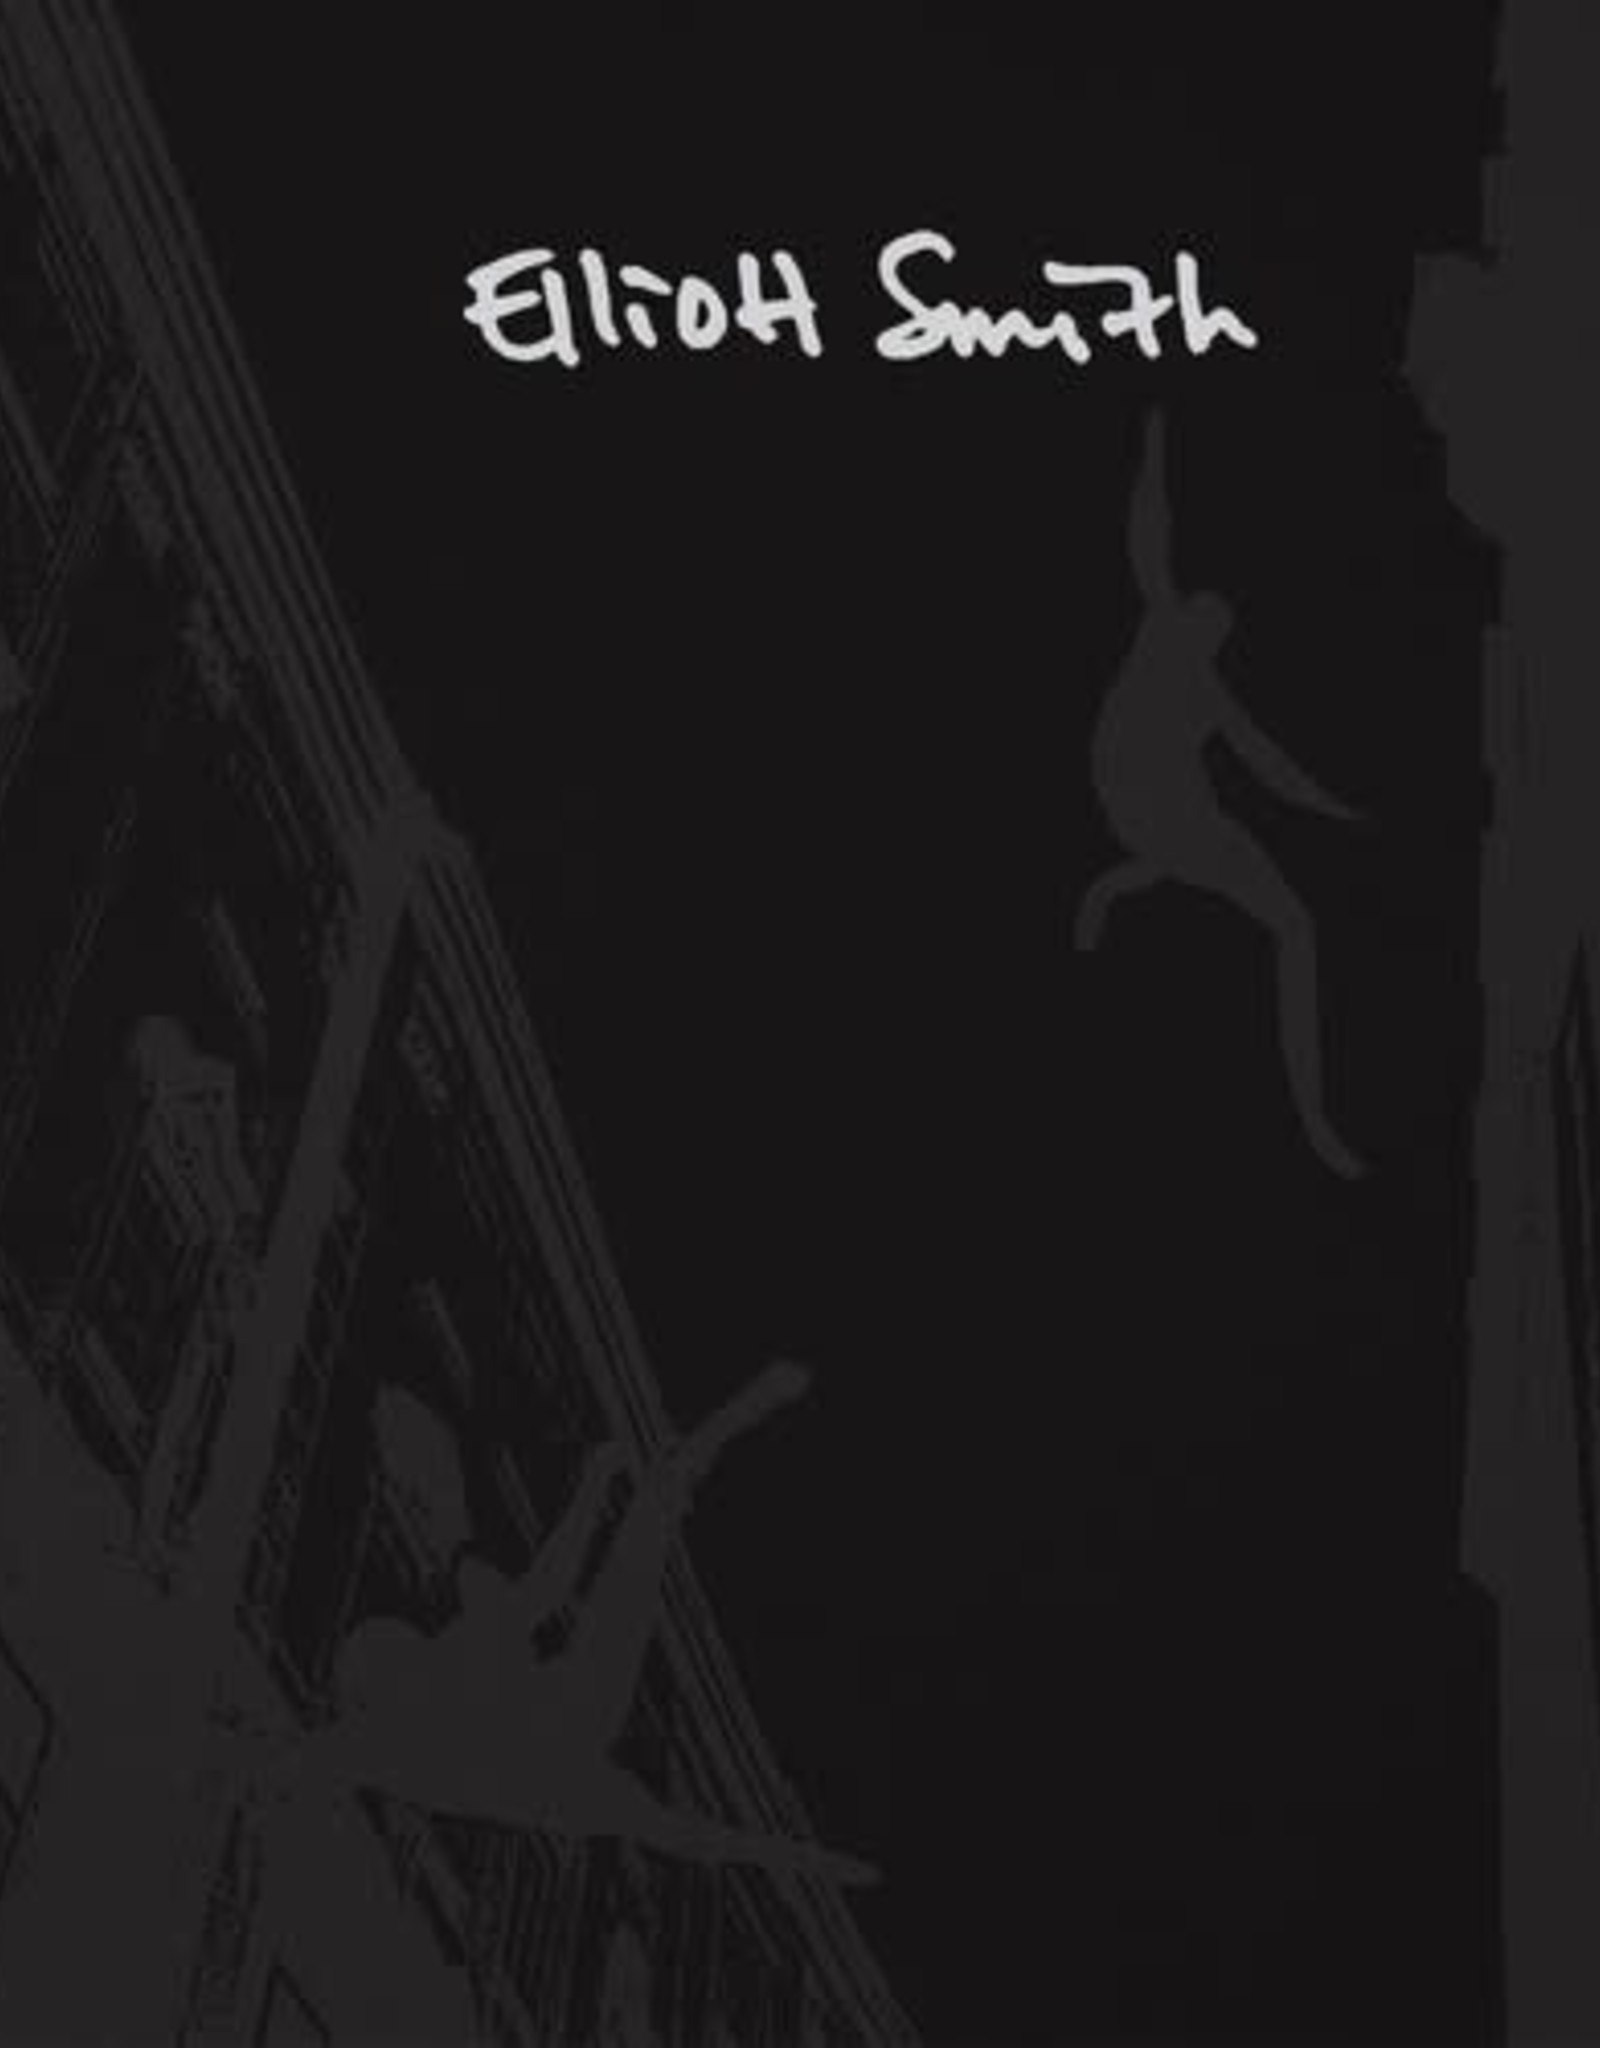 Smith, Elliot / Elliot Smith 25th Anniversary